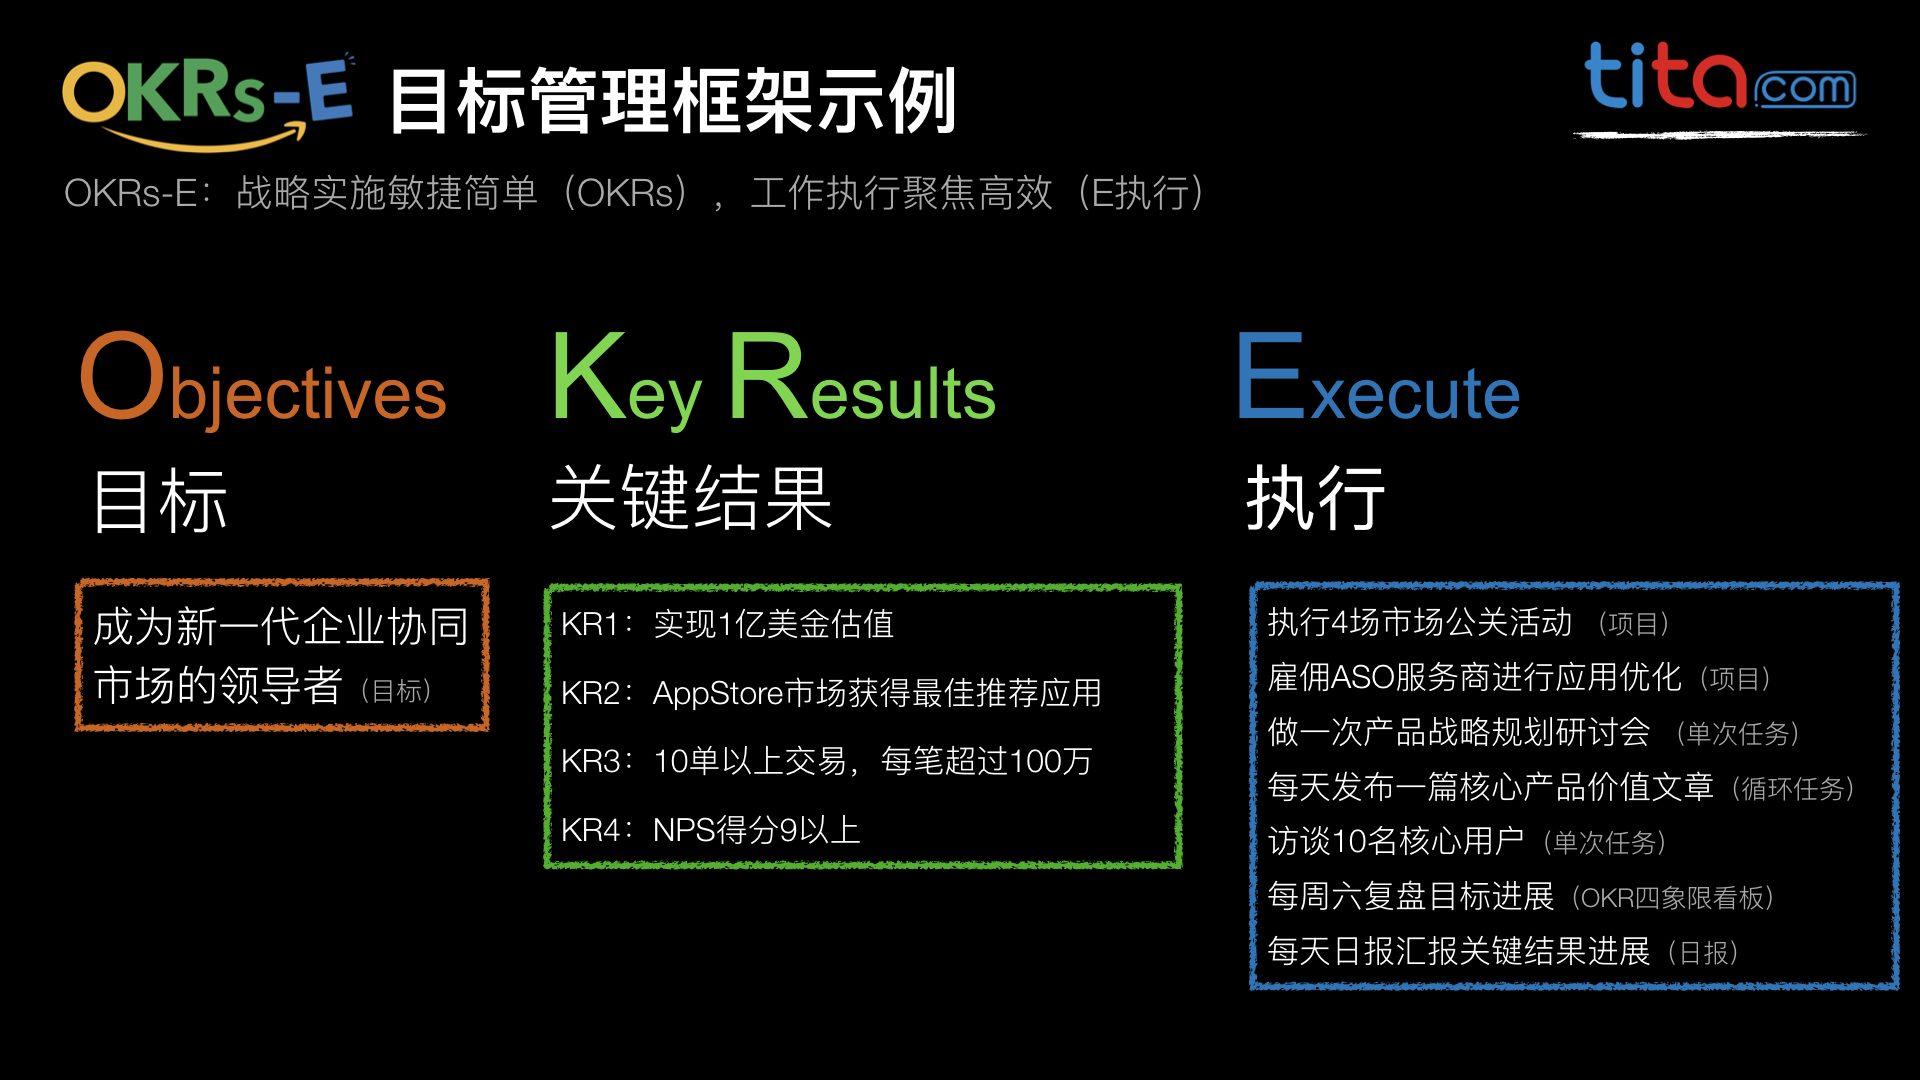 OKRs-E 目标管理框架(图片来源tita.com)